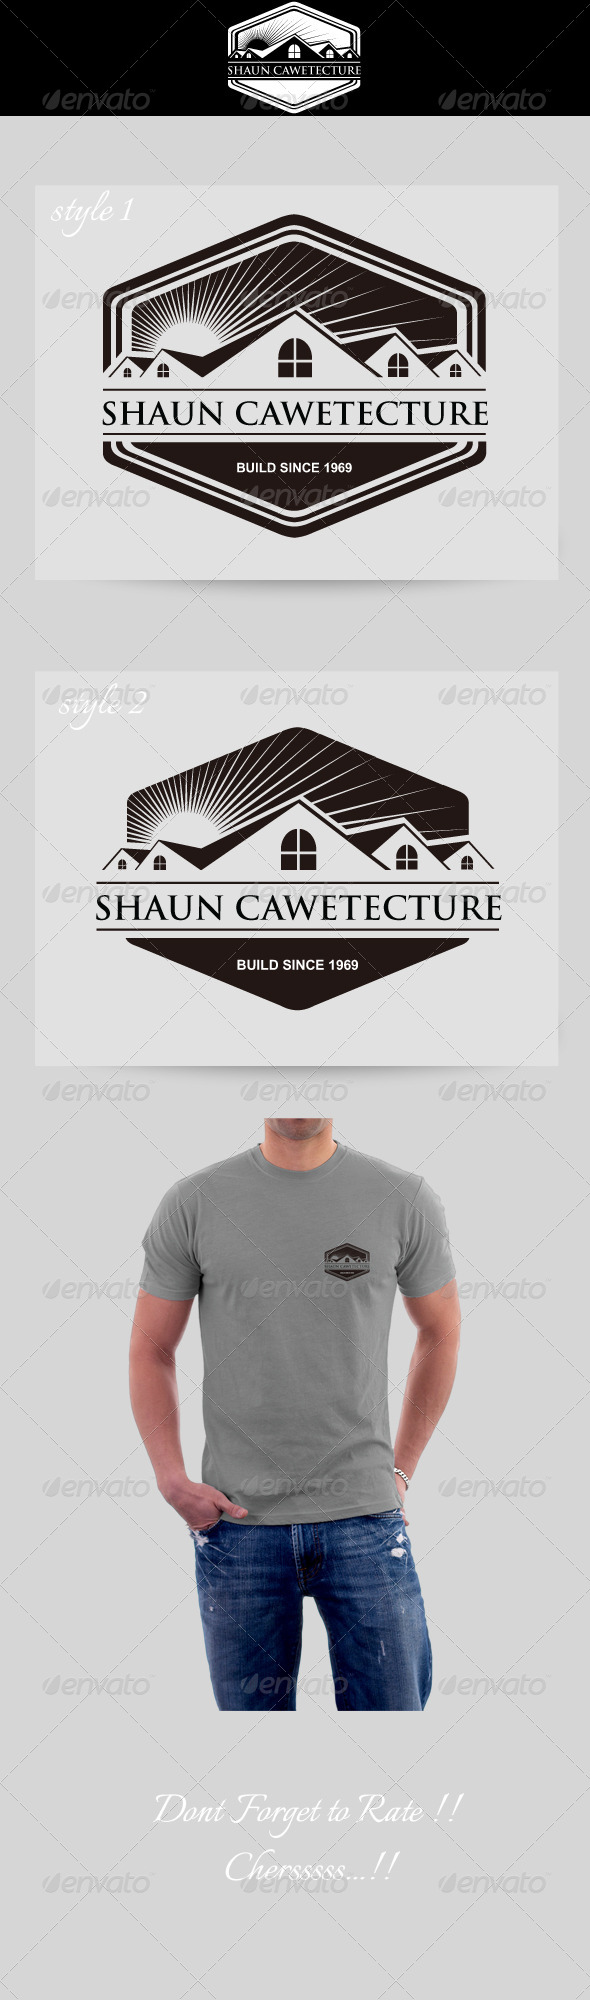 GraphicRiver Architecture Vintage Logo Cawetecture 4548496